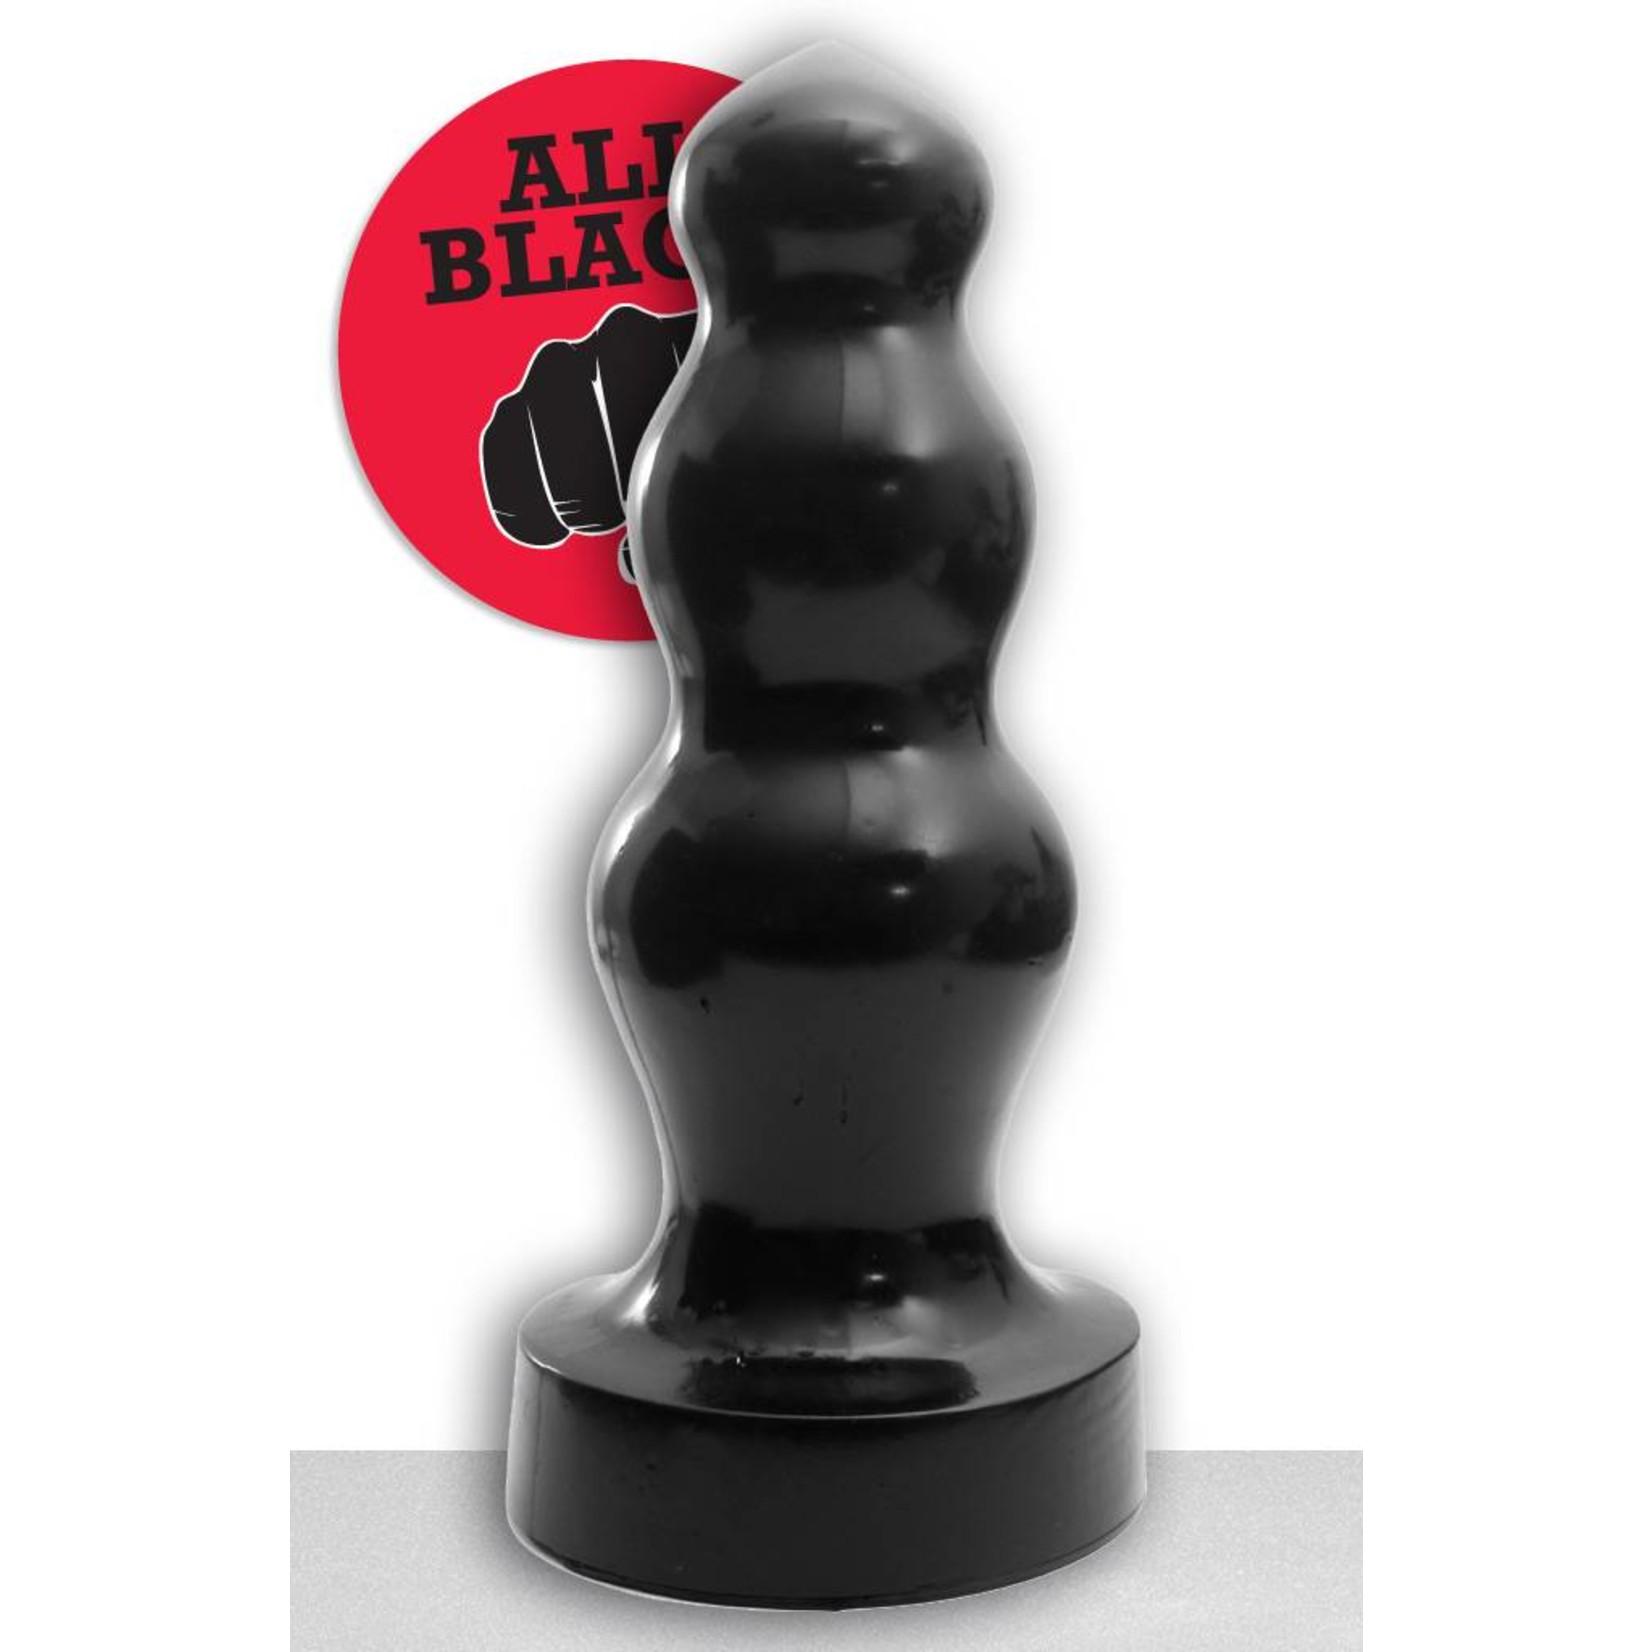 All Black All Black Dildo - AB 56